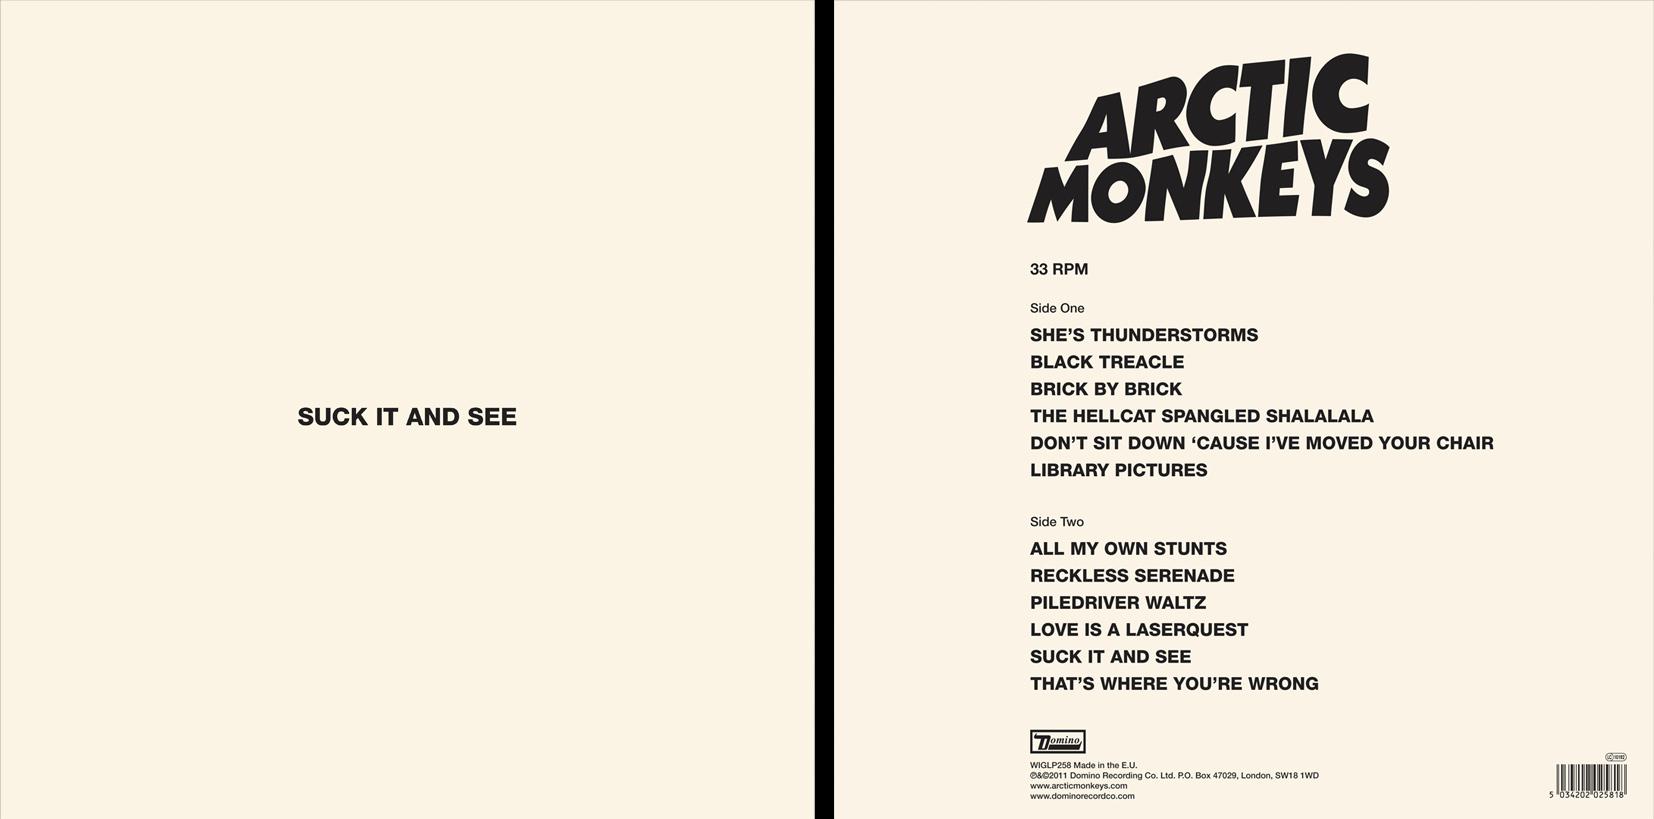 Suck It And See / Arctic Monkeys Album Artwork